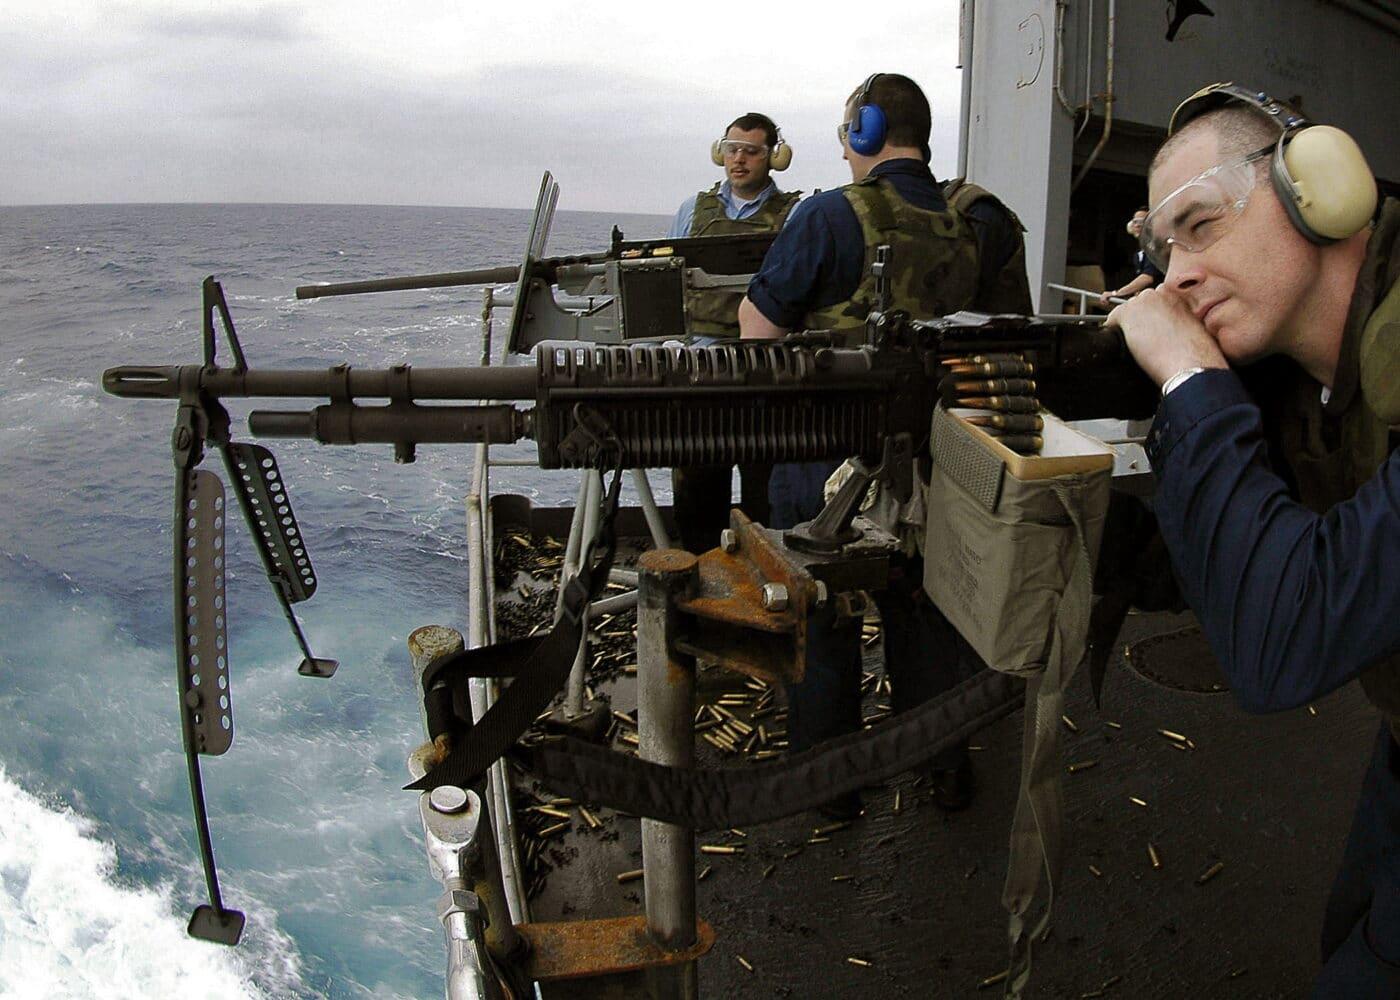 U.S. Navy sailors firing the M60 machine gun during ship exercises